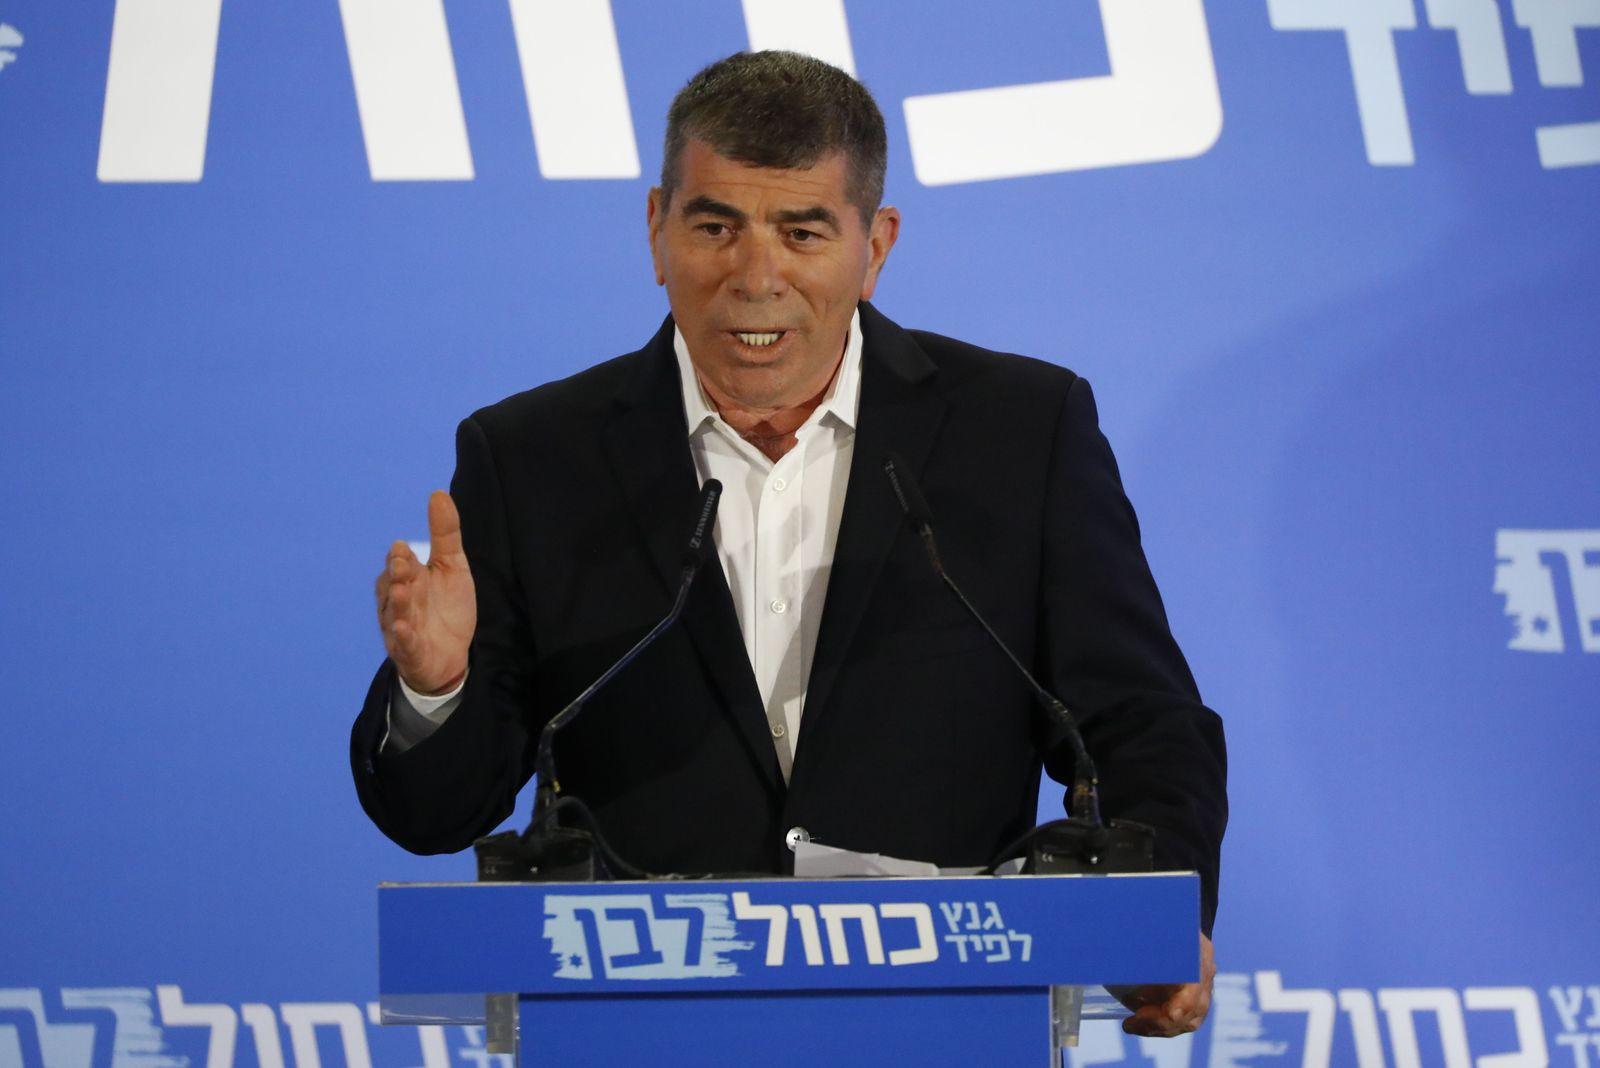 FILES-ISRAEL-POLITICS-DIPLOMACY